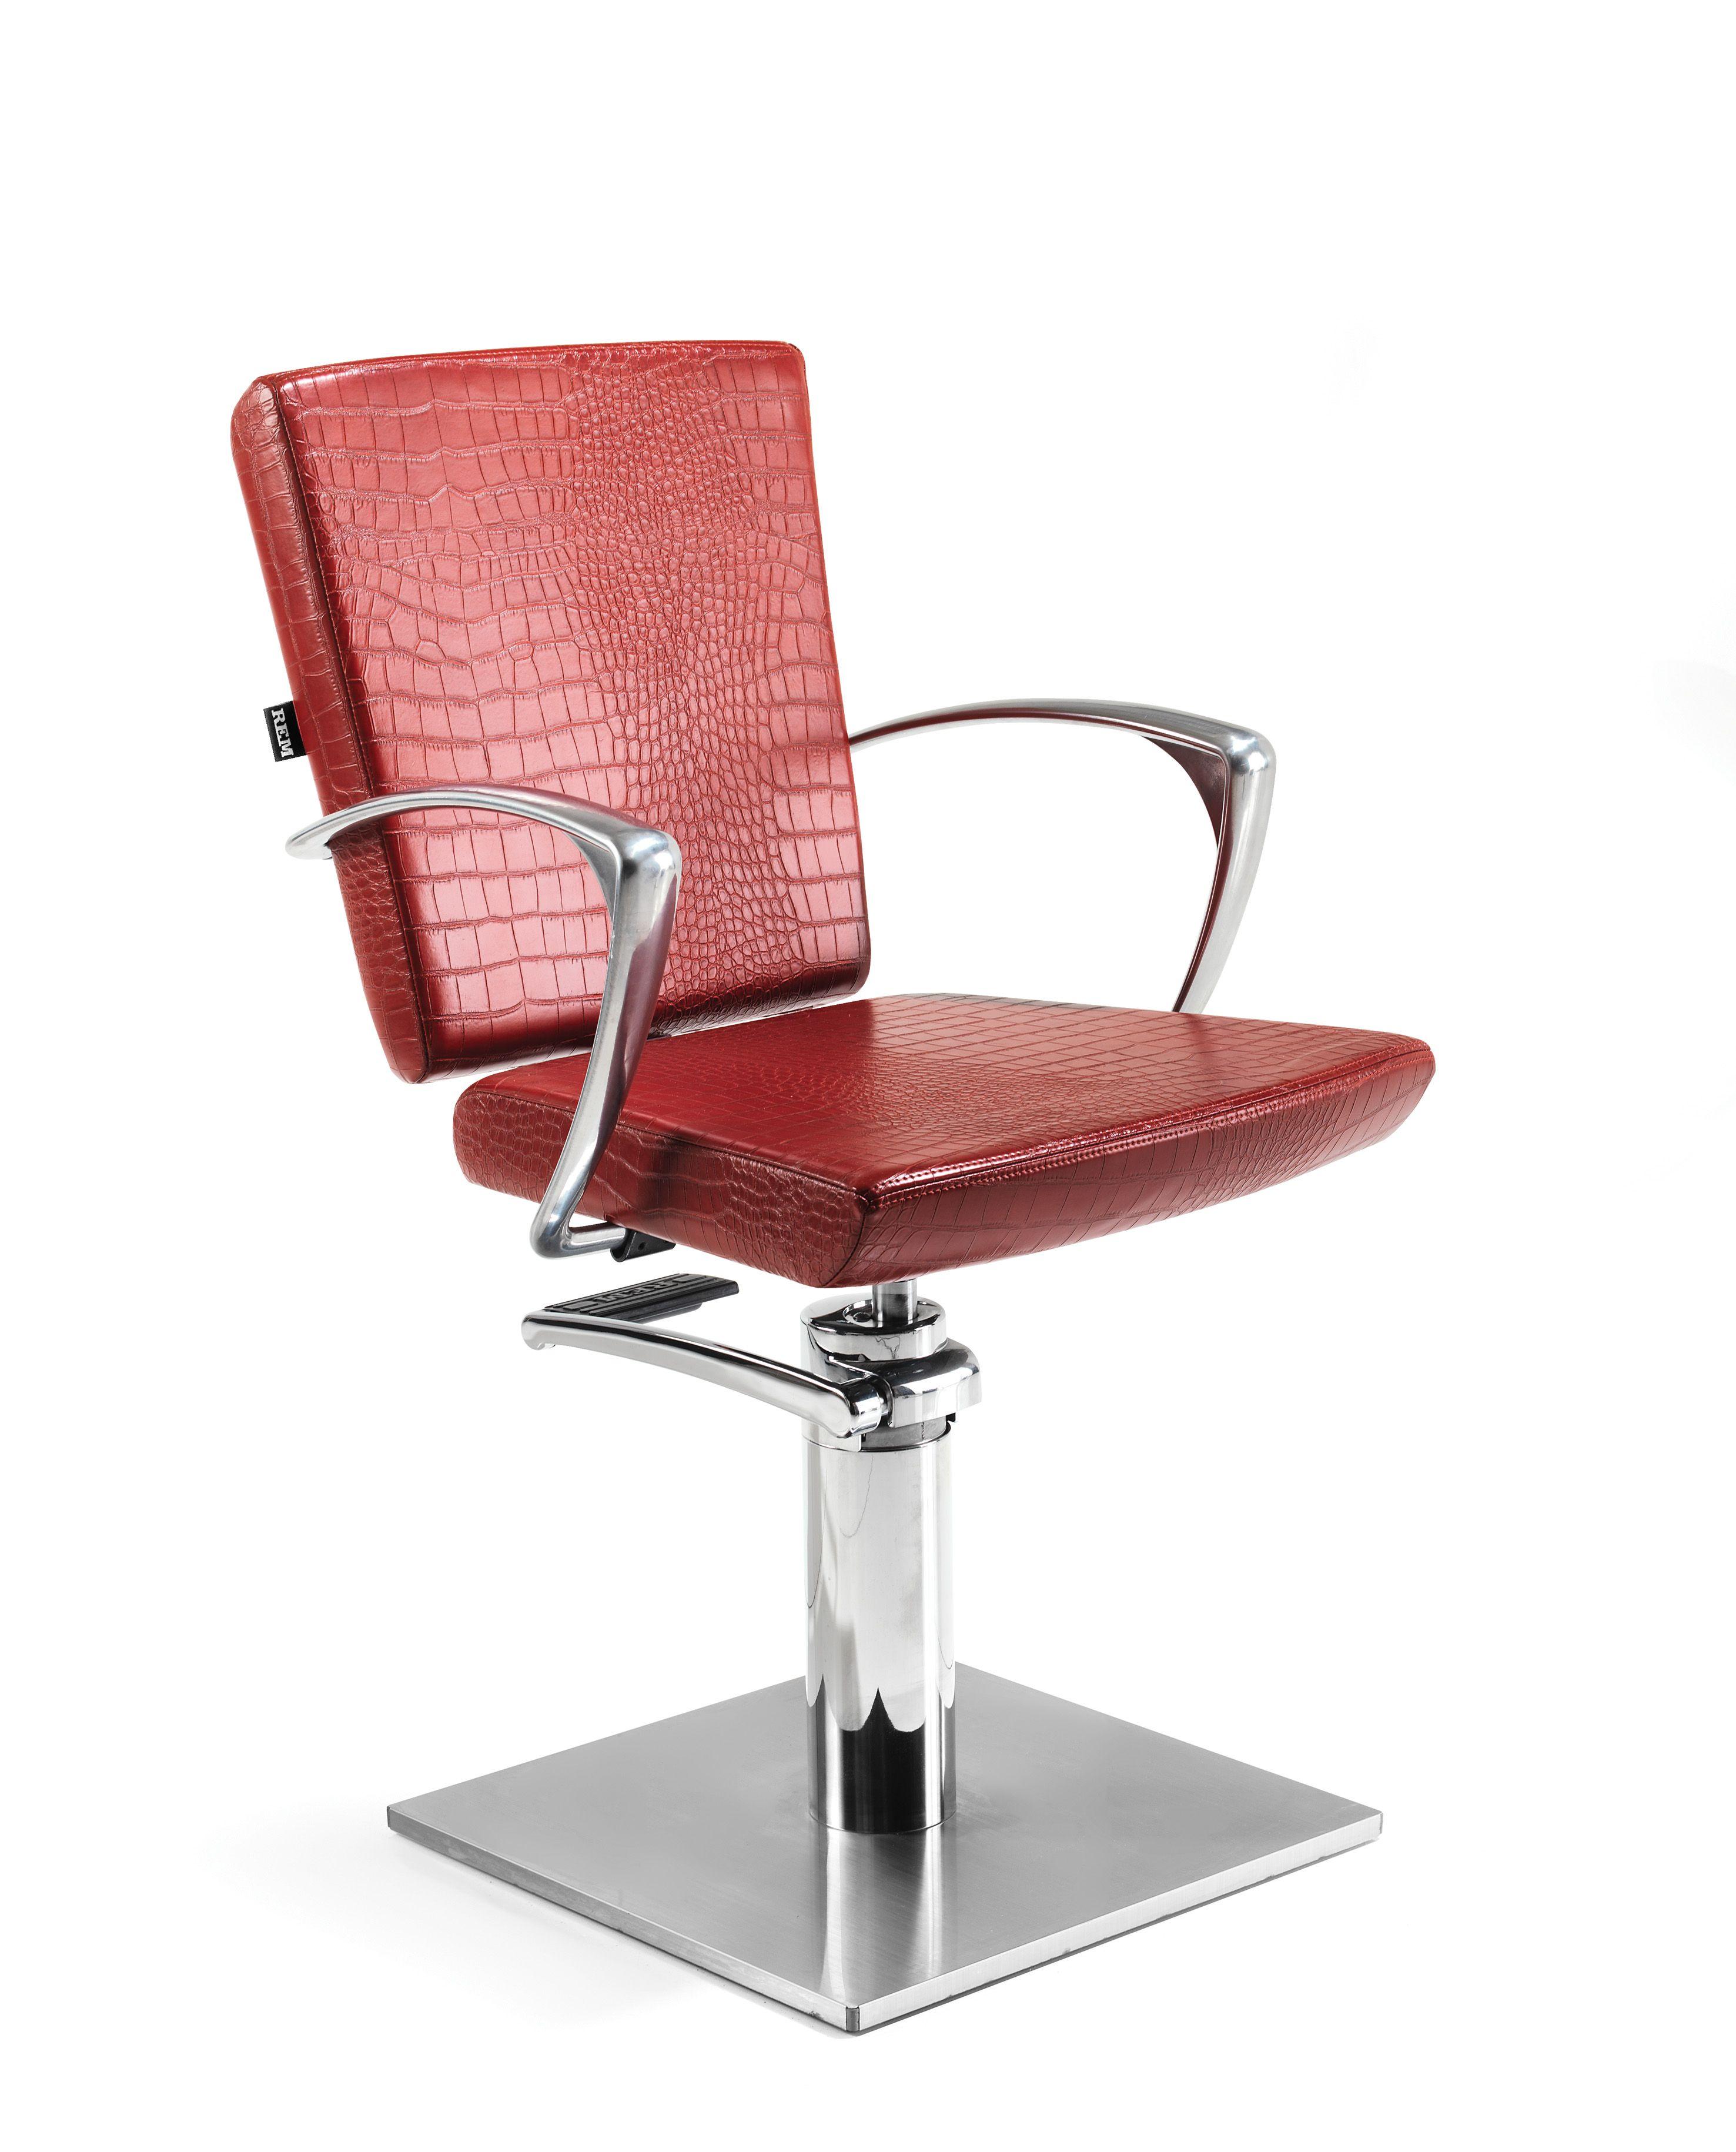 Vision salon styling chair by REM .rem.co.uk  sc 1 st  Pinterest & Vision salon styling chair by REM www.rem.co.uk | Furniture Deco ...